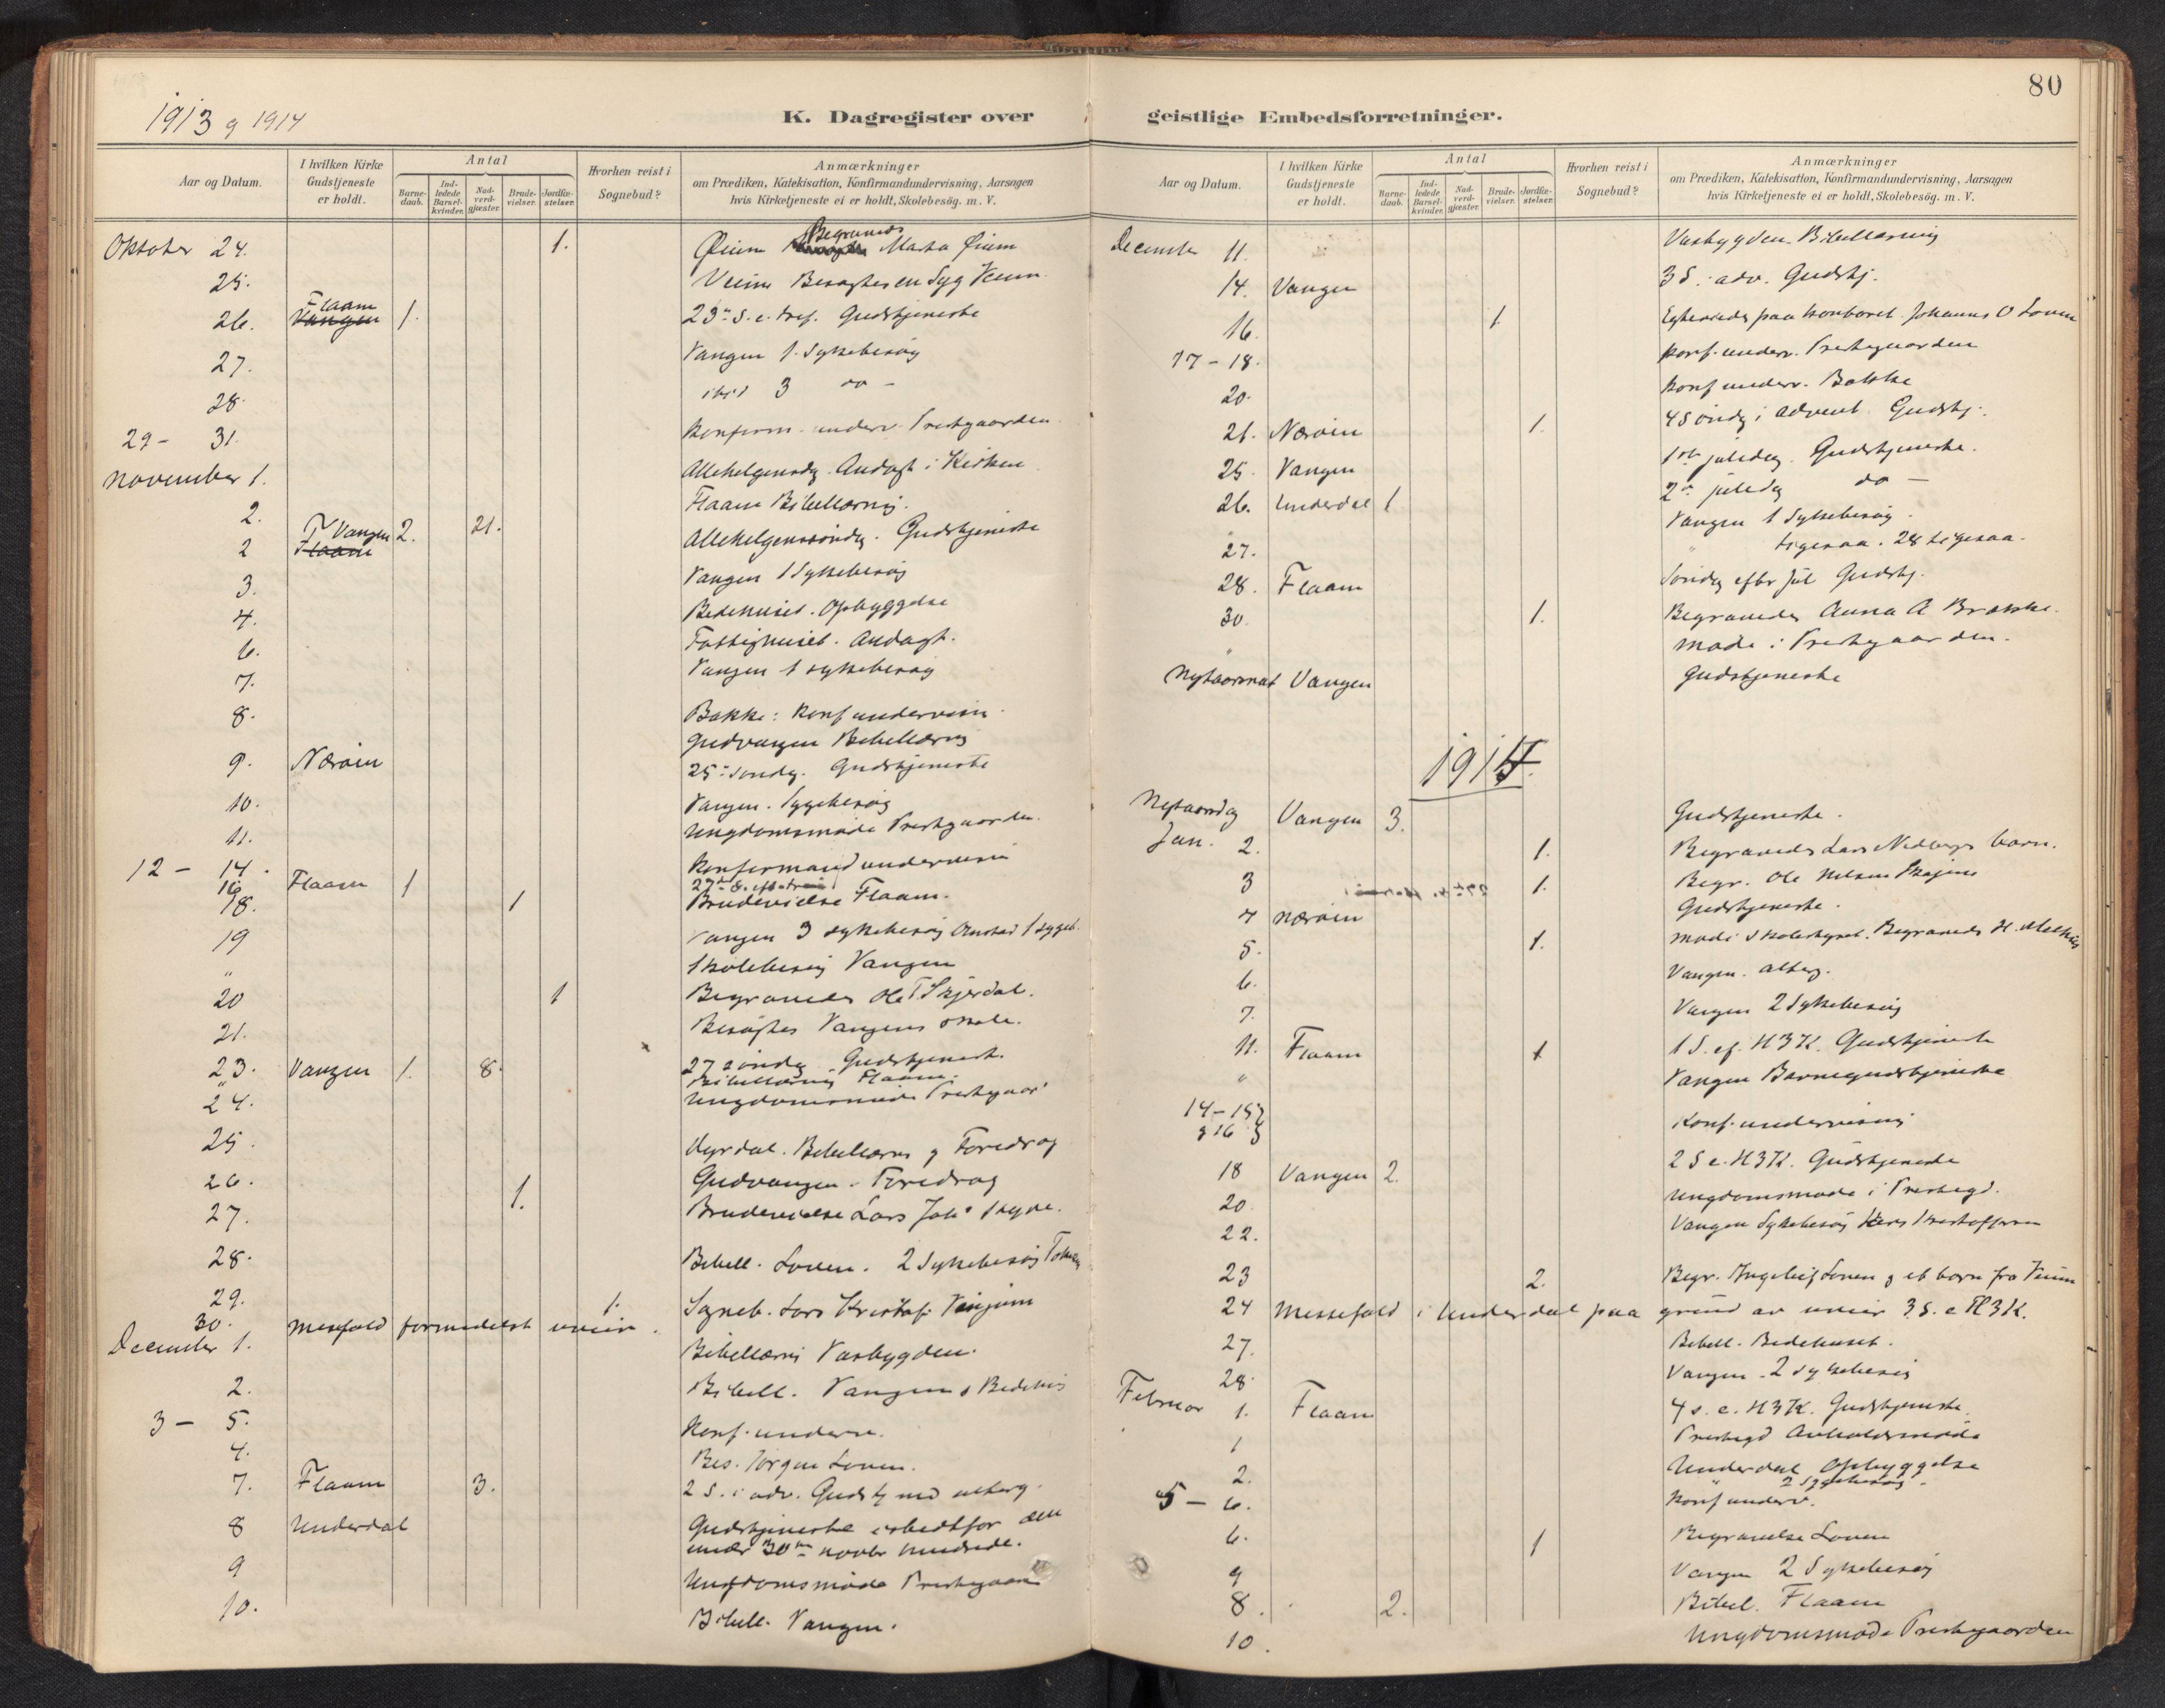 SAB, Aurland Sokneprestembete*, Diary records no. F 2, 1891-1932, p. 79b-80a